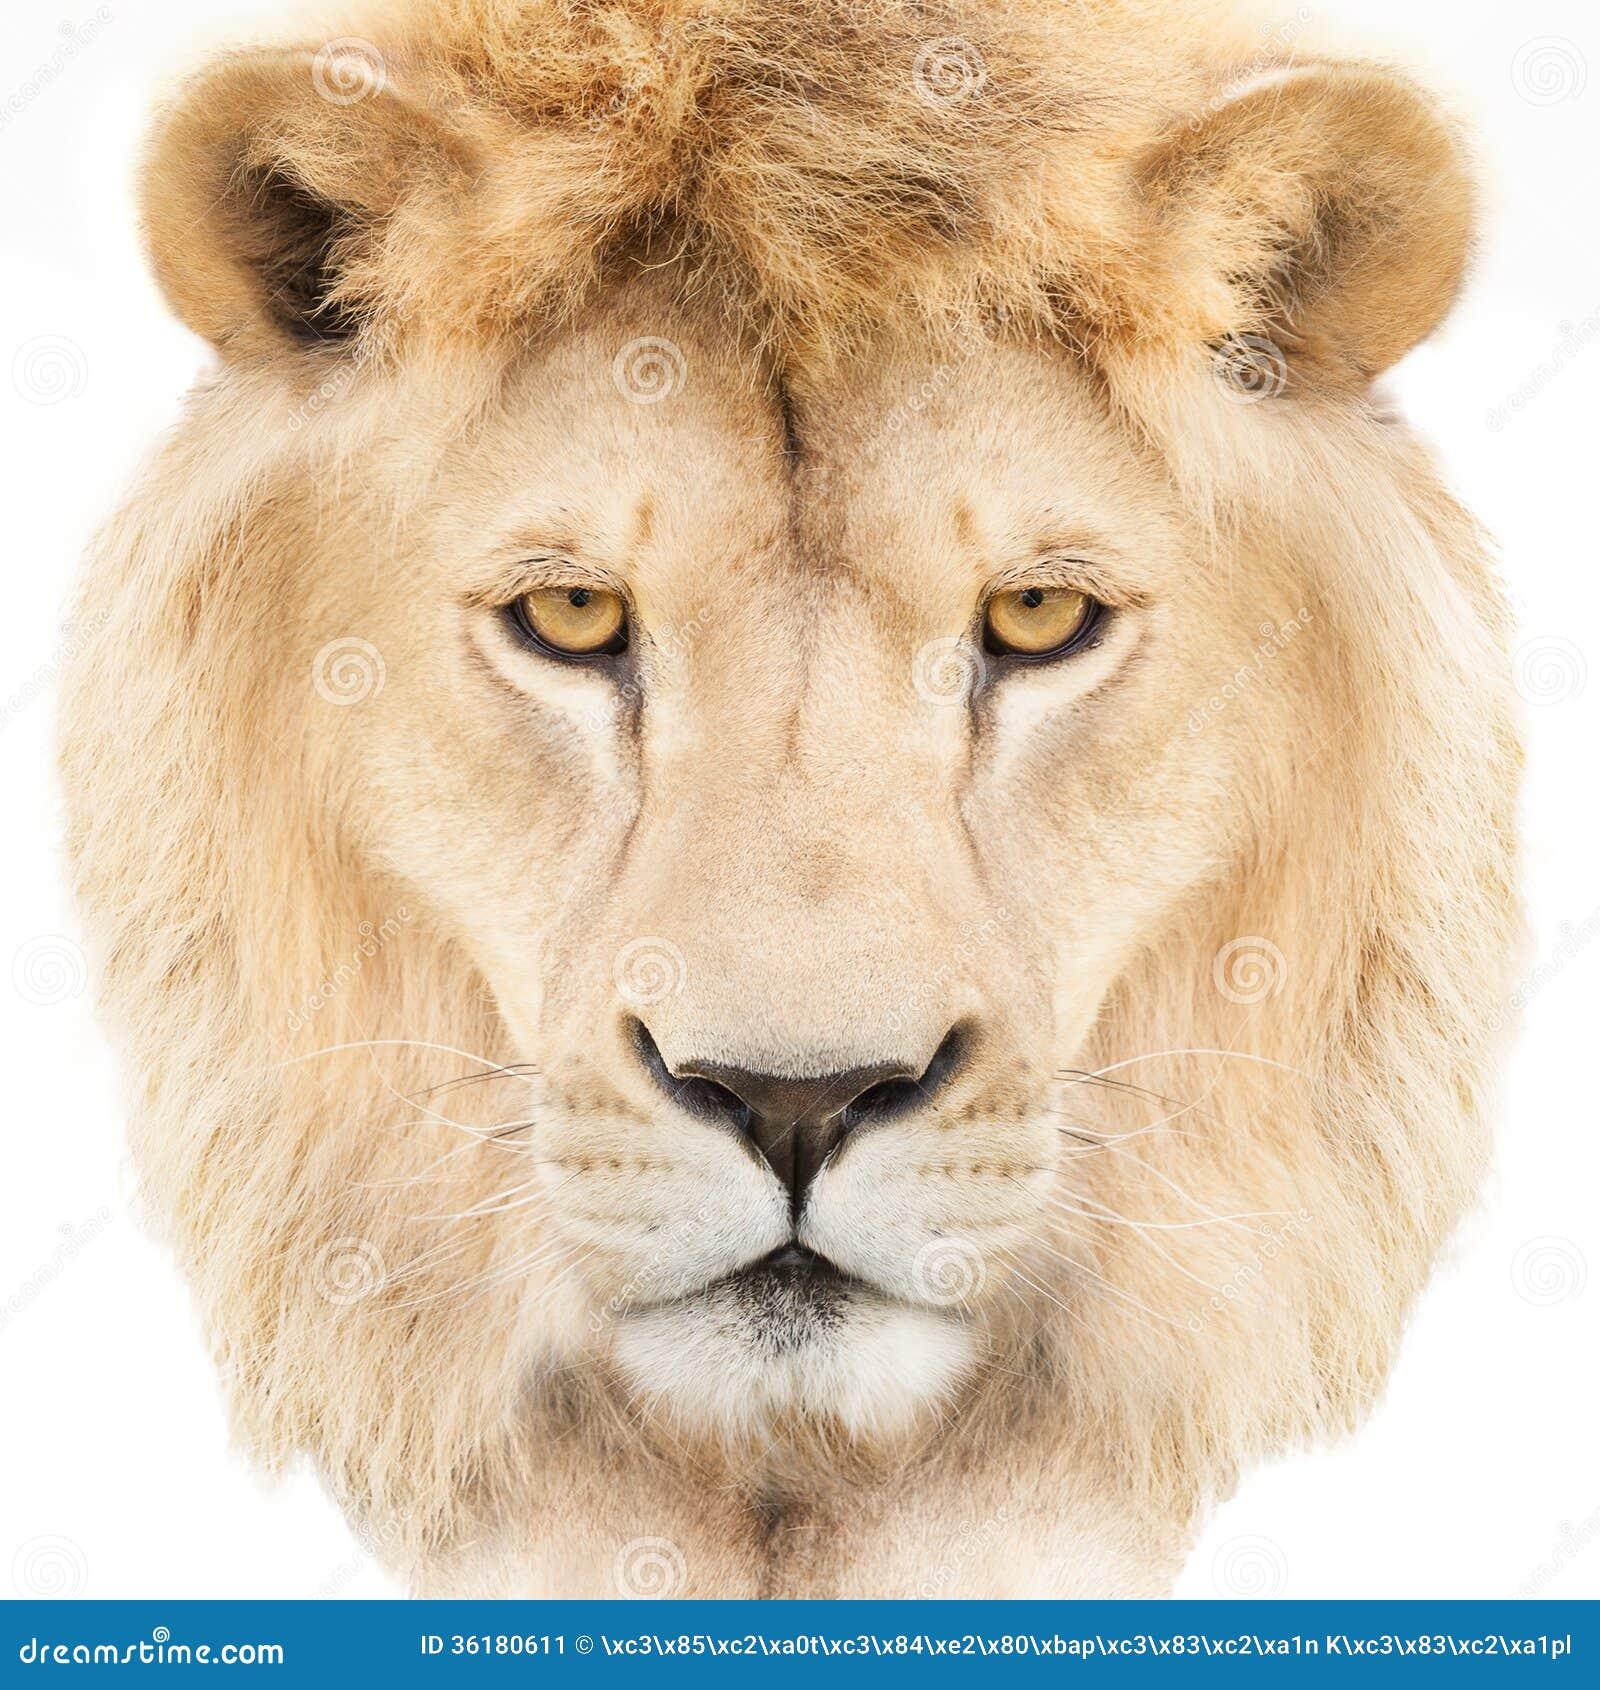 White lion face images - photo#10